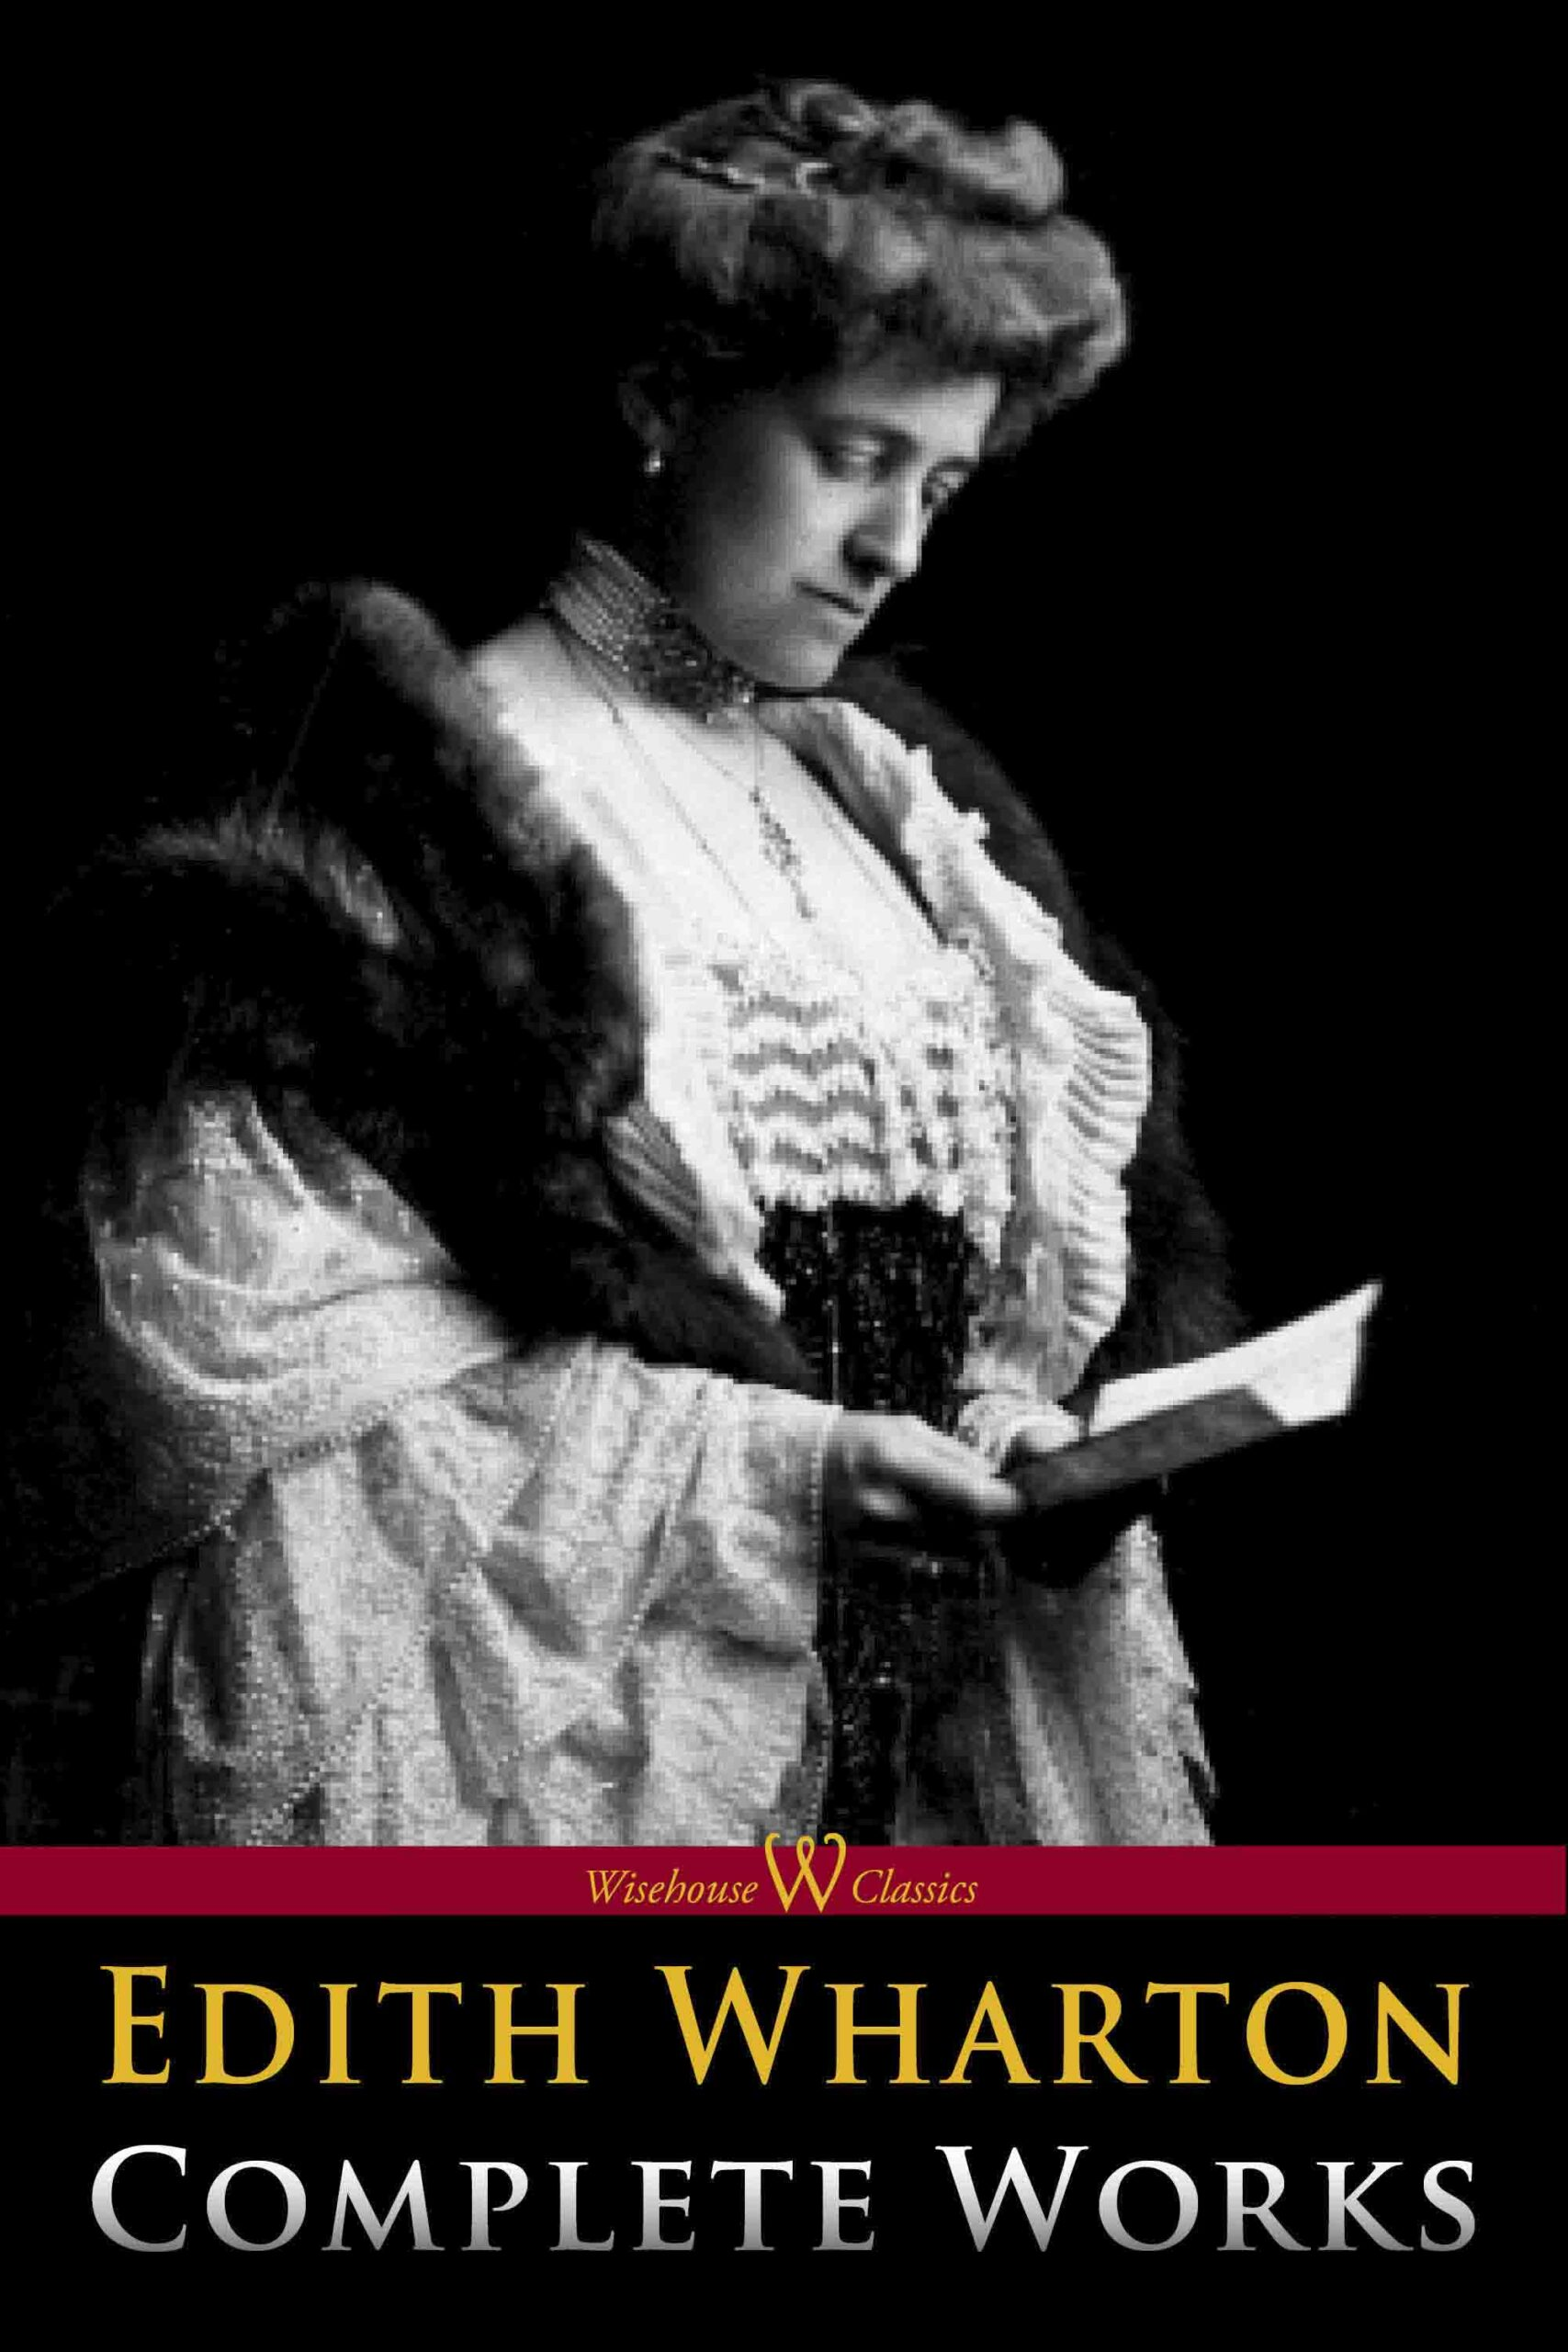 Edith Wharton: Complete Works